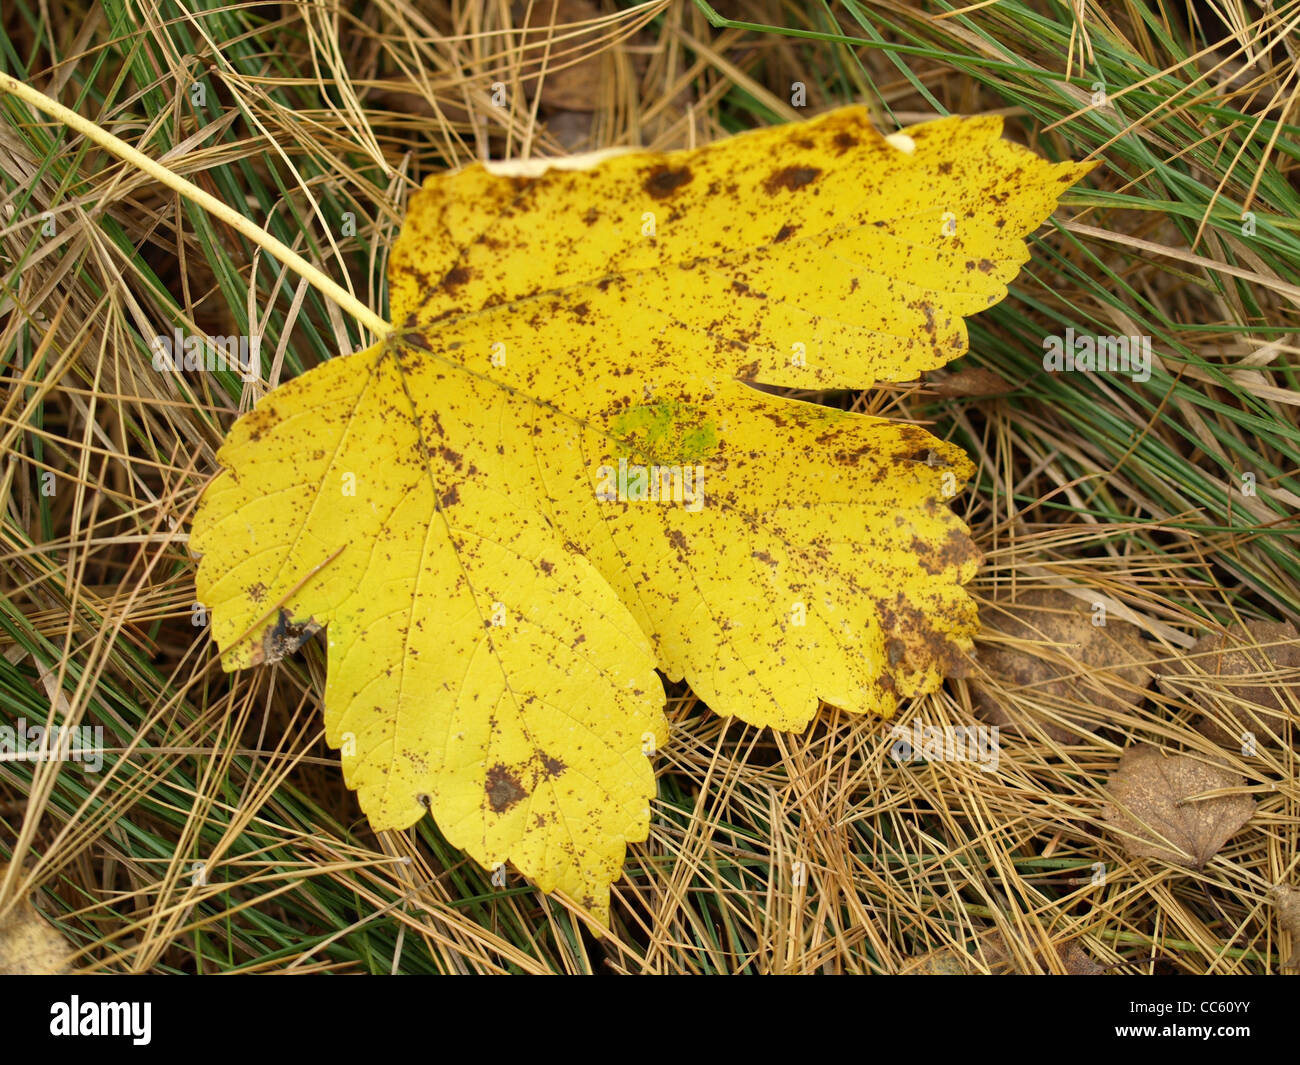 fallen off leaf in autumn / abgefallenes Blatt im Herbst Stock Photo